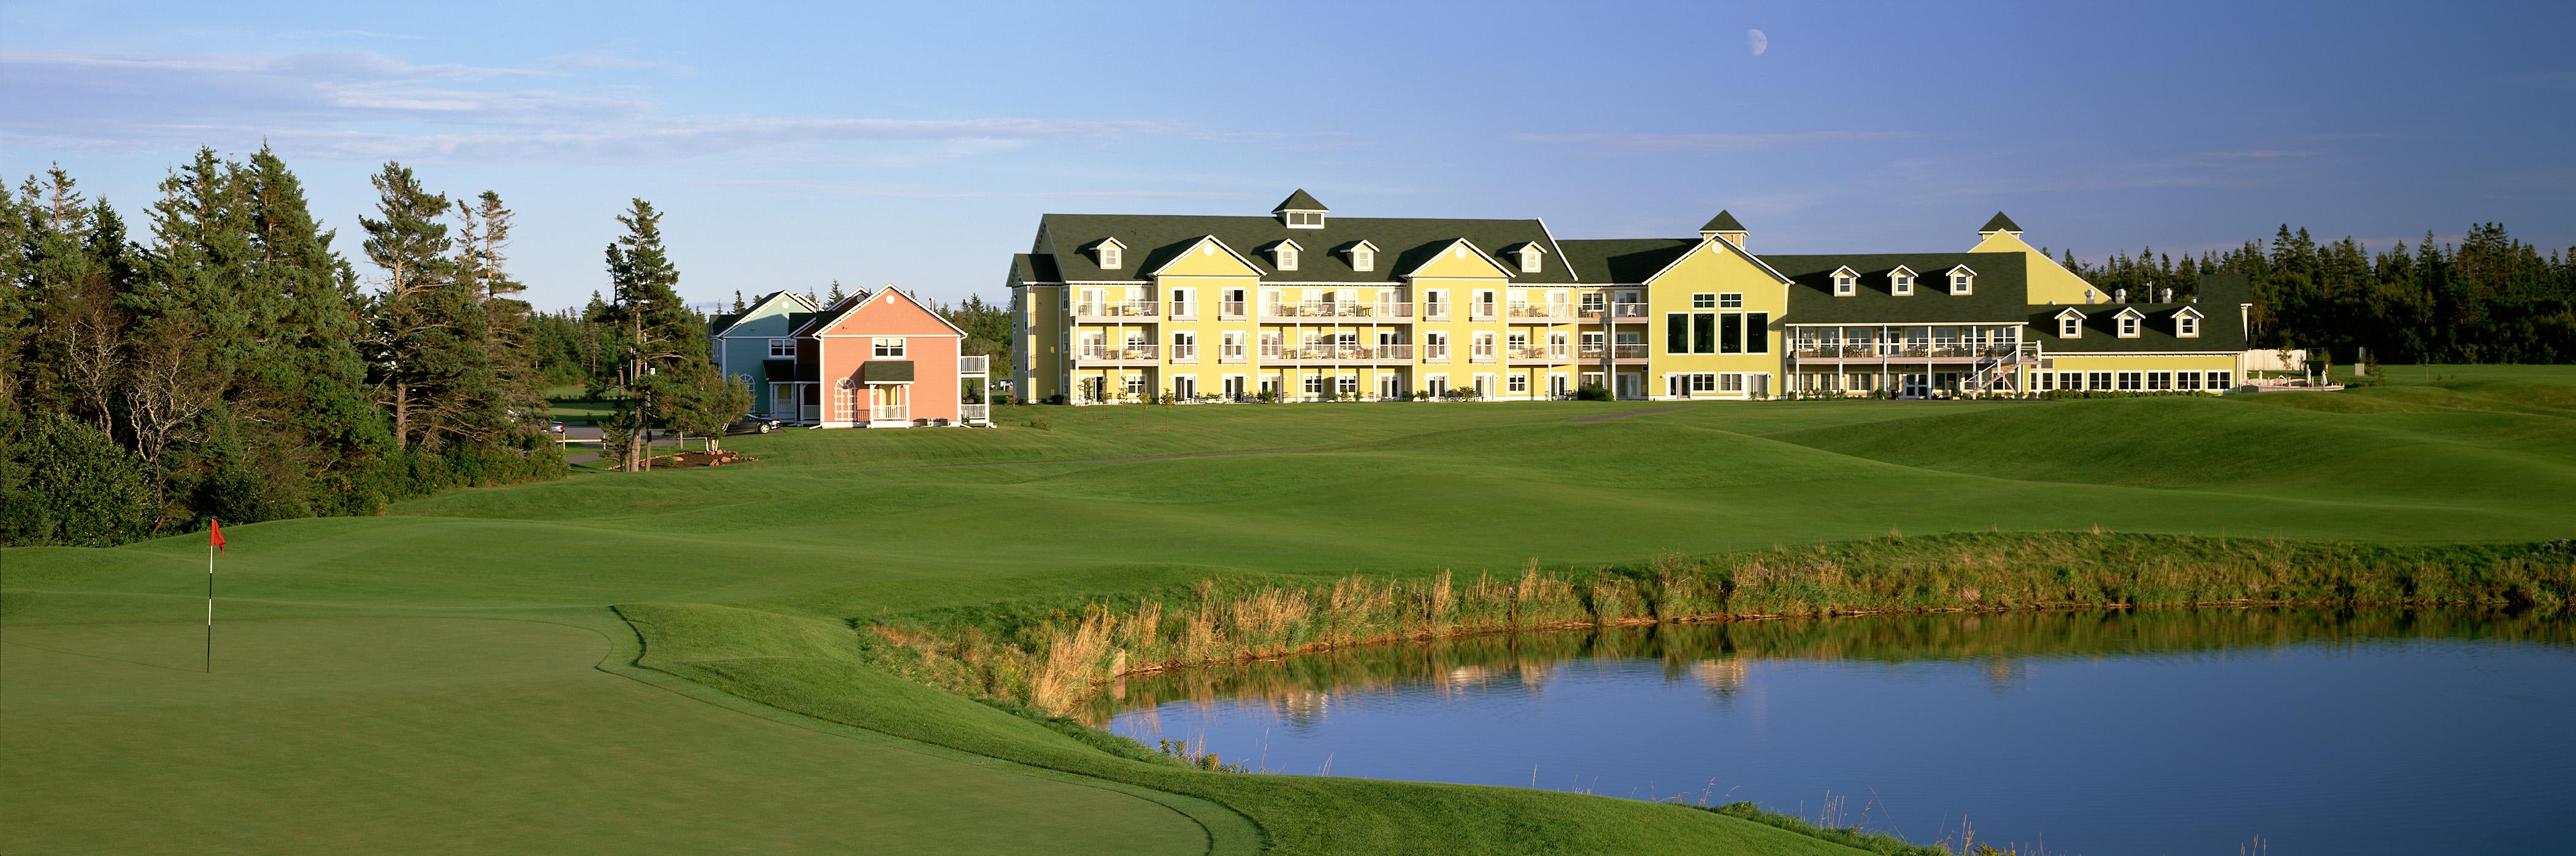 Rodd Crowbush Golf Amp Beach Resort Prince Edward Island